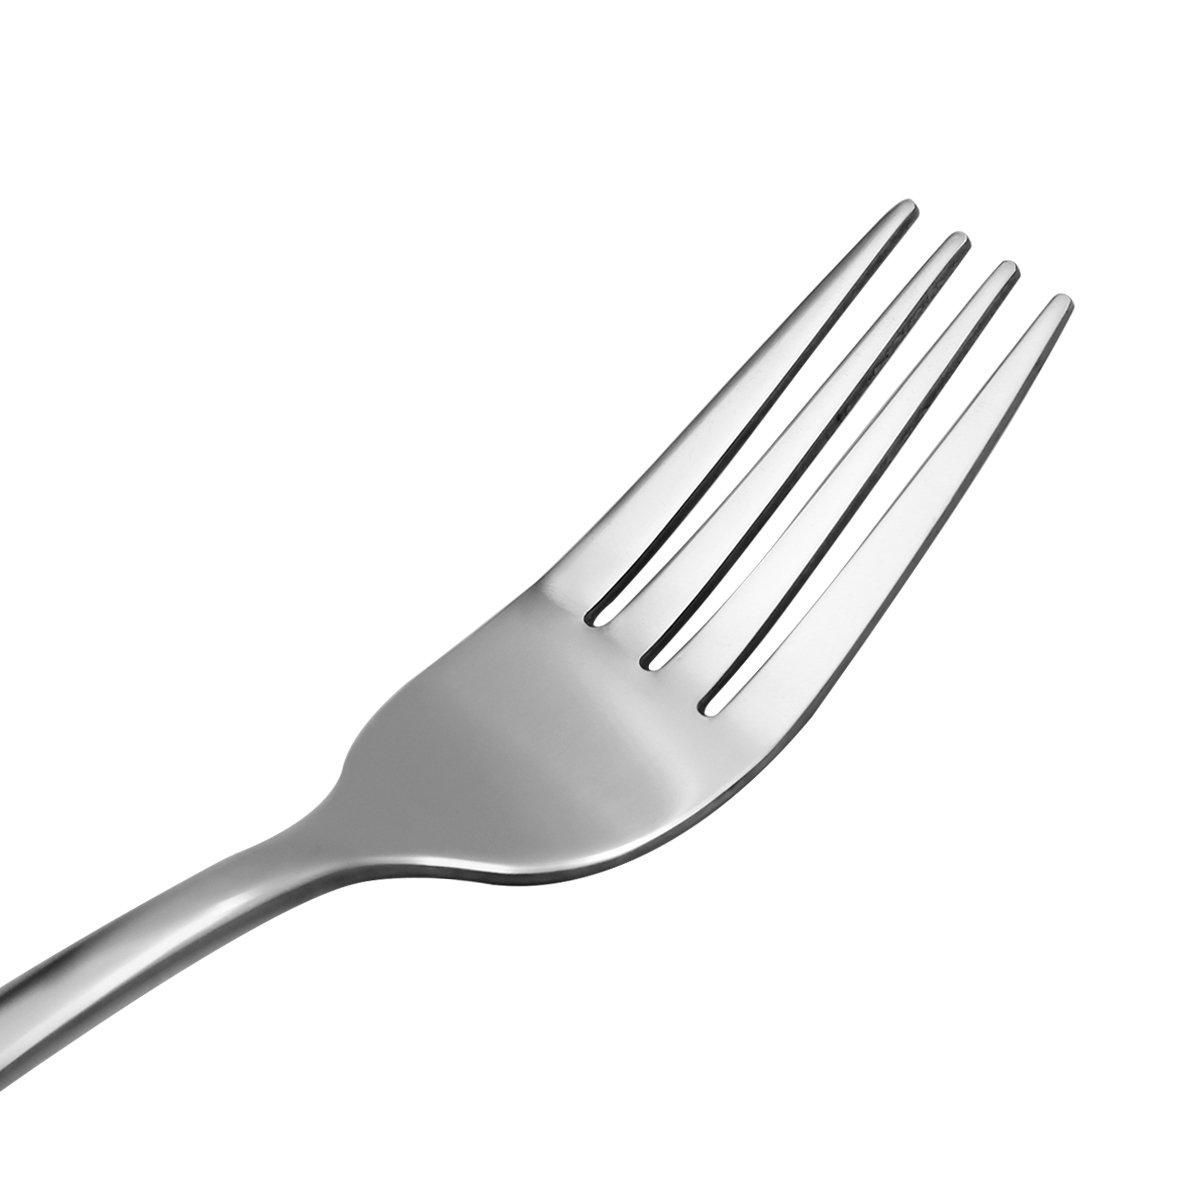 Hippih Dinner Fork Flatware Set 12 Piece Anti-Scald Metal Cutlery Set